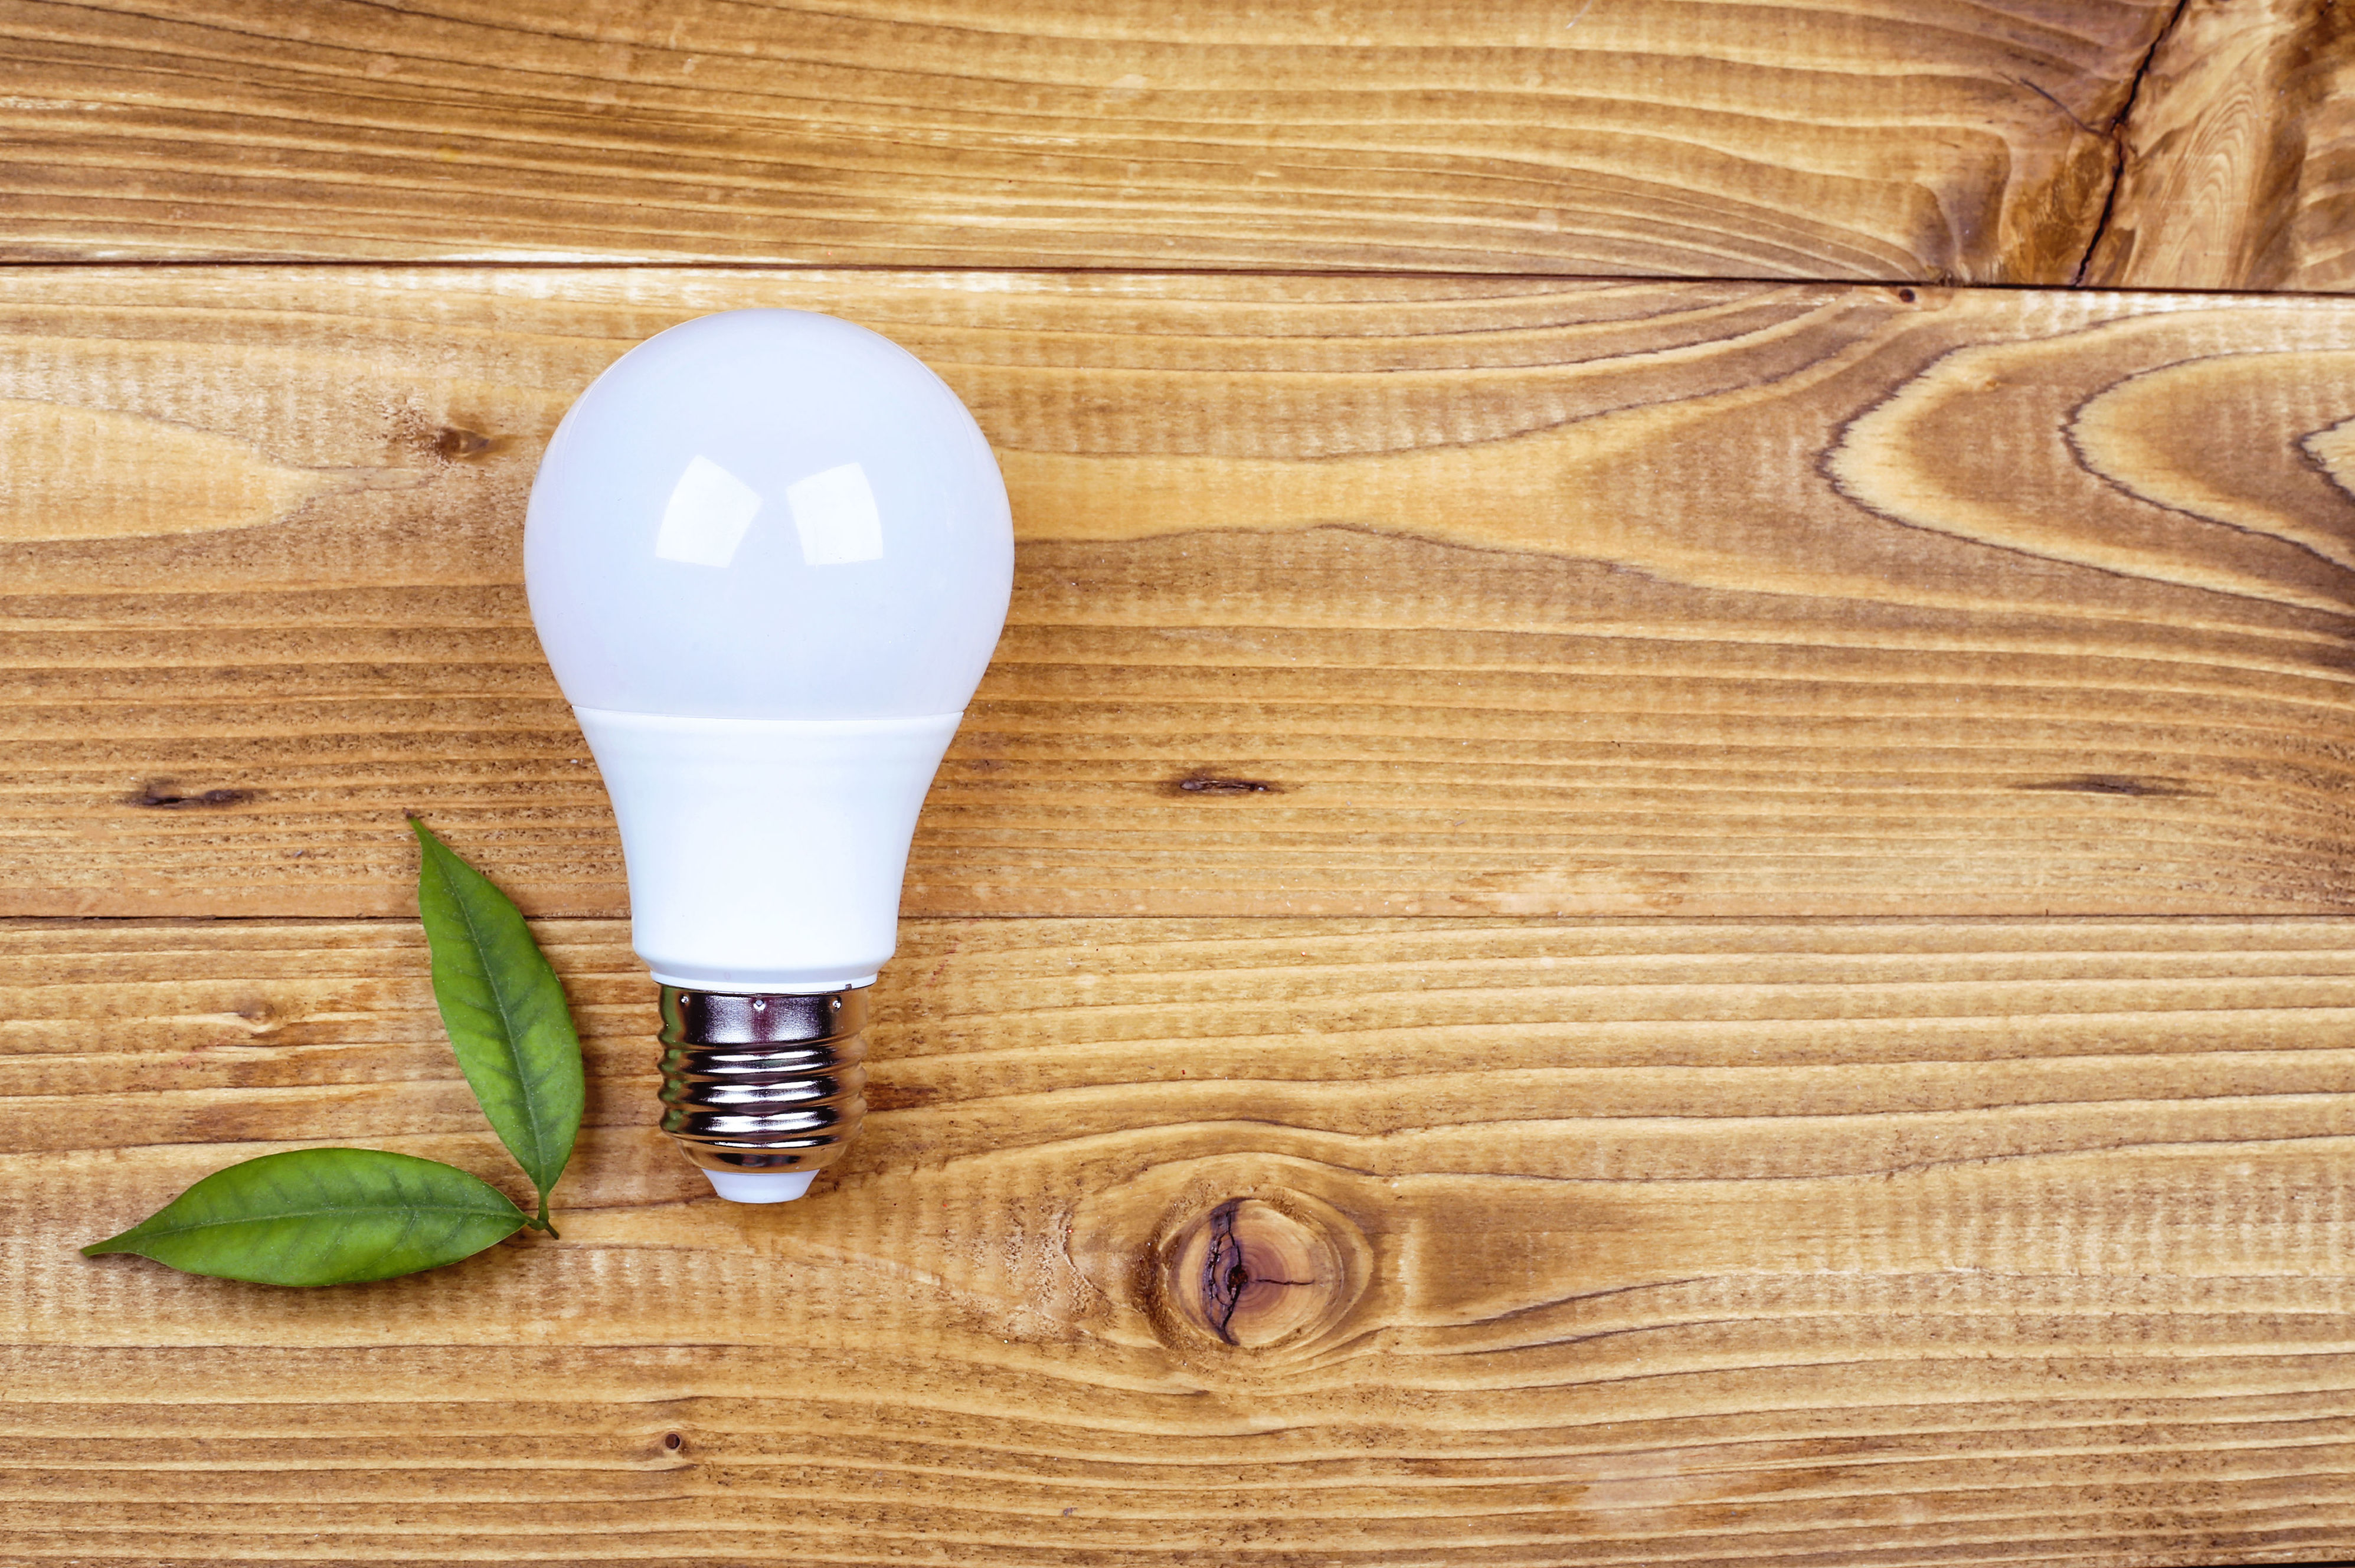 IMPORTANTES AHORROS ENERGETICOS ILUMINACION TIPO LED